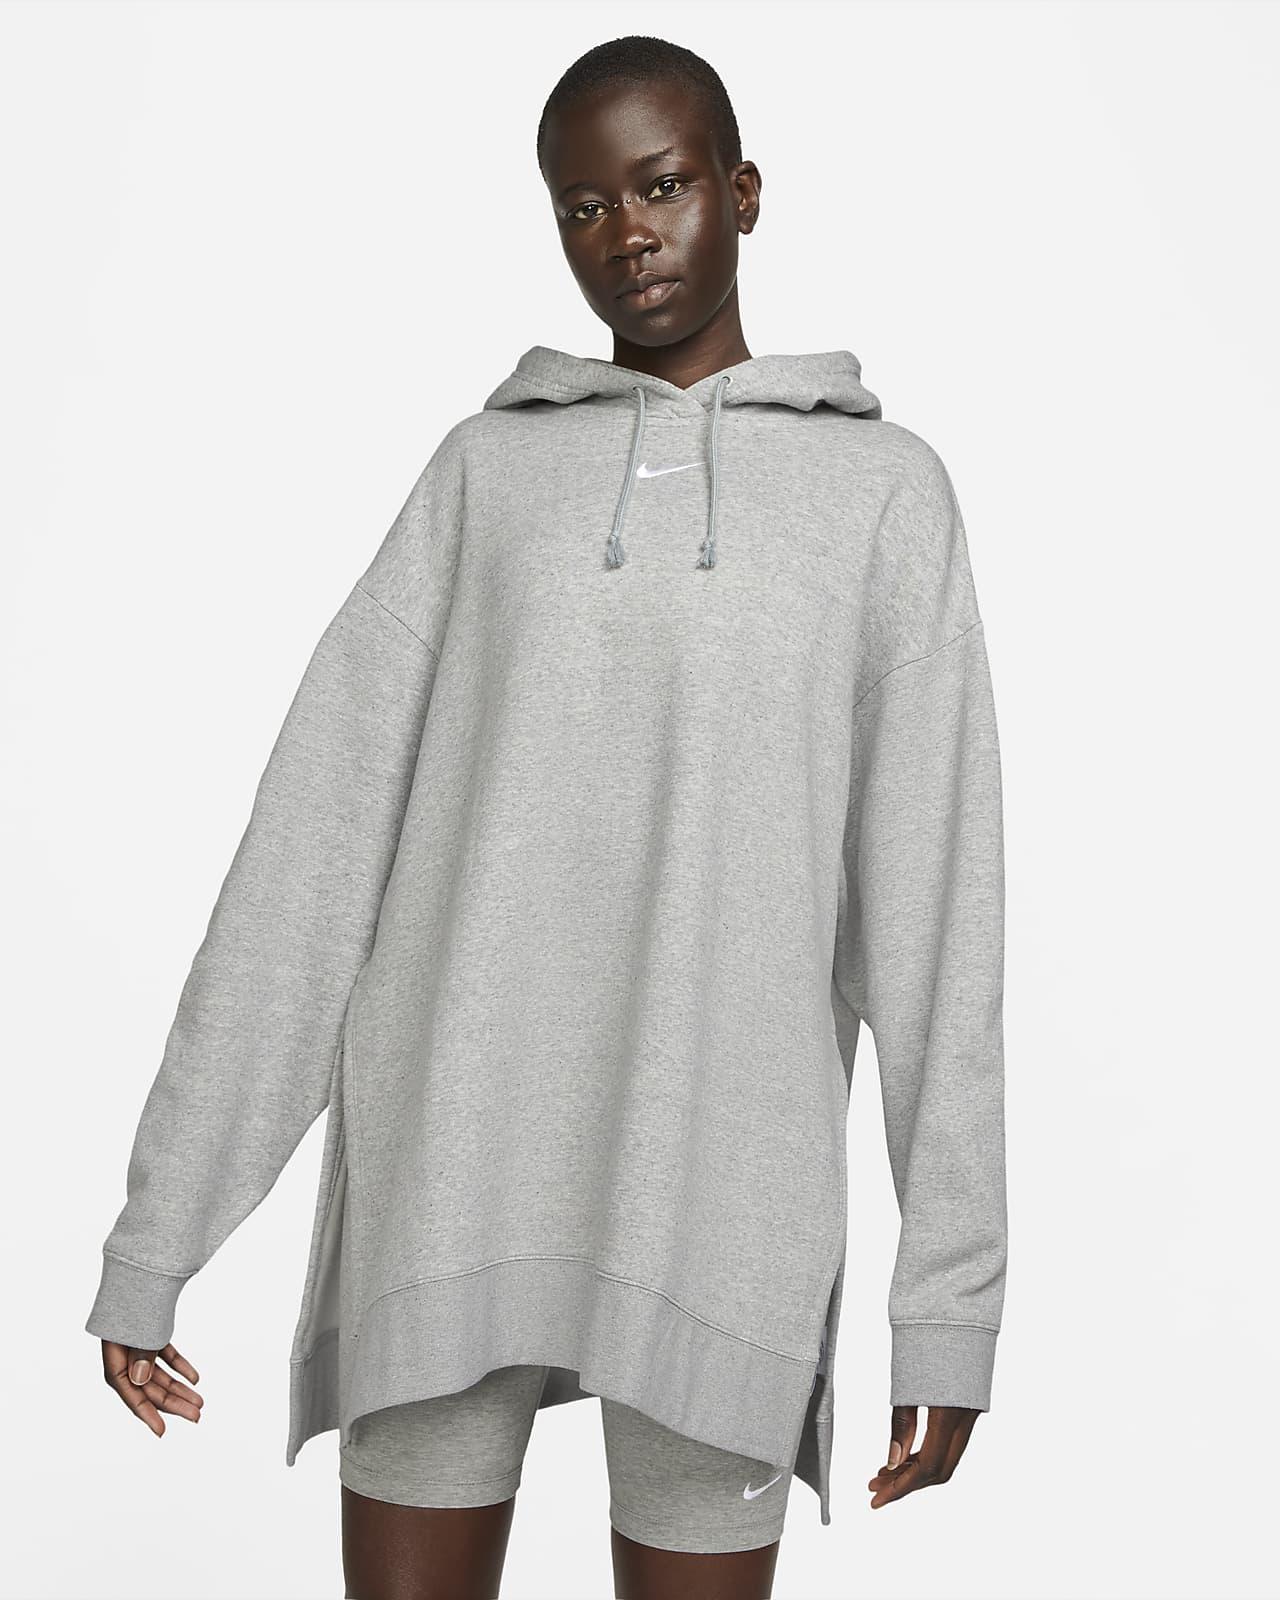 Nike Sportswear Essential-Fleece-Hoodie für Damen